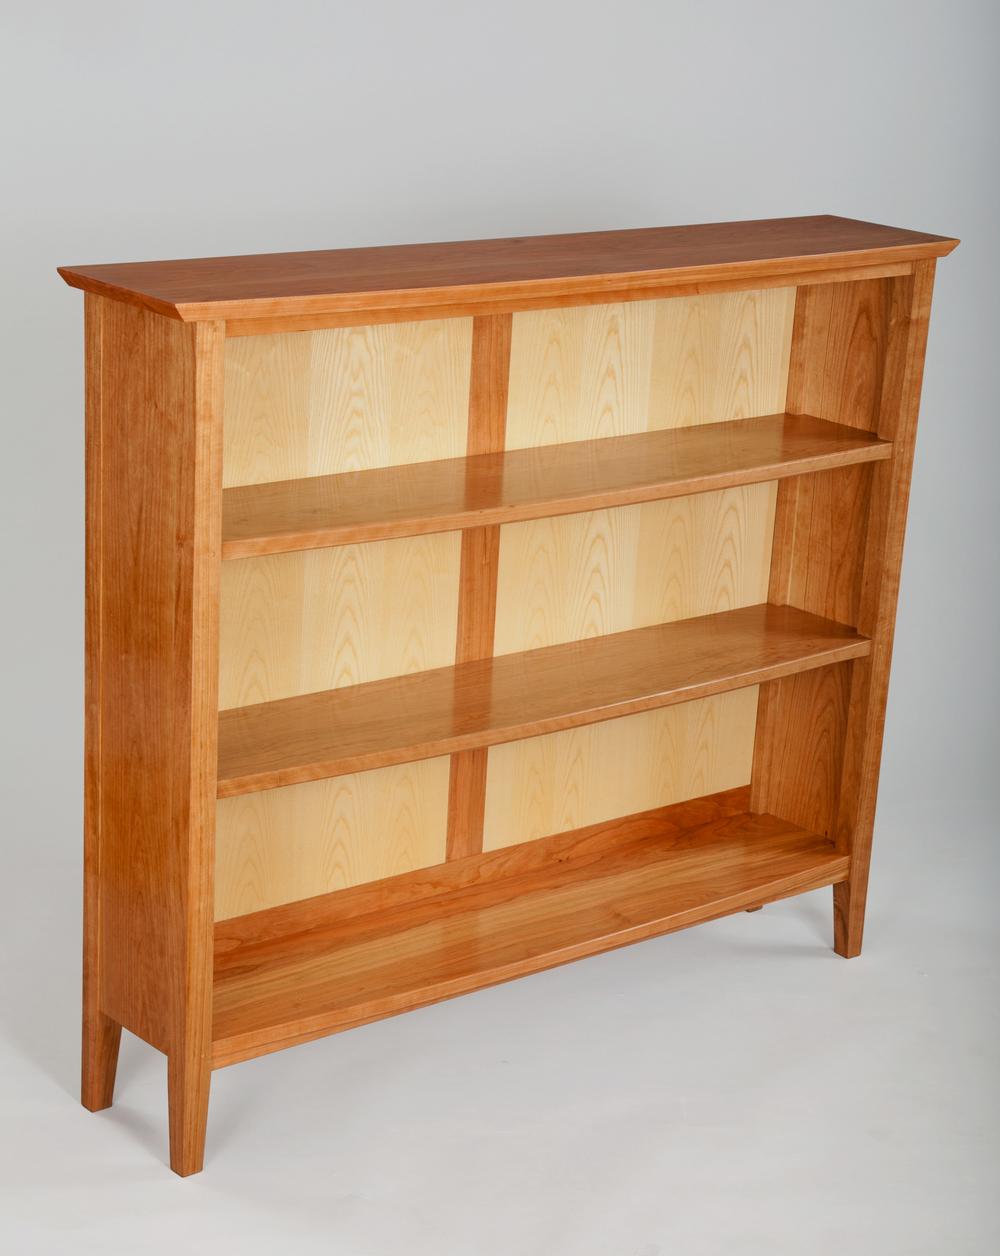 bookcases_lg.jpg